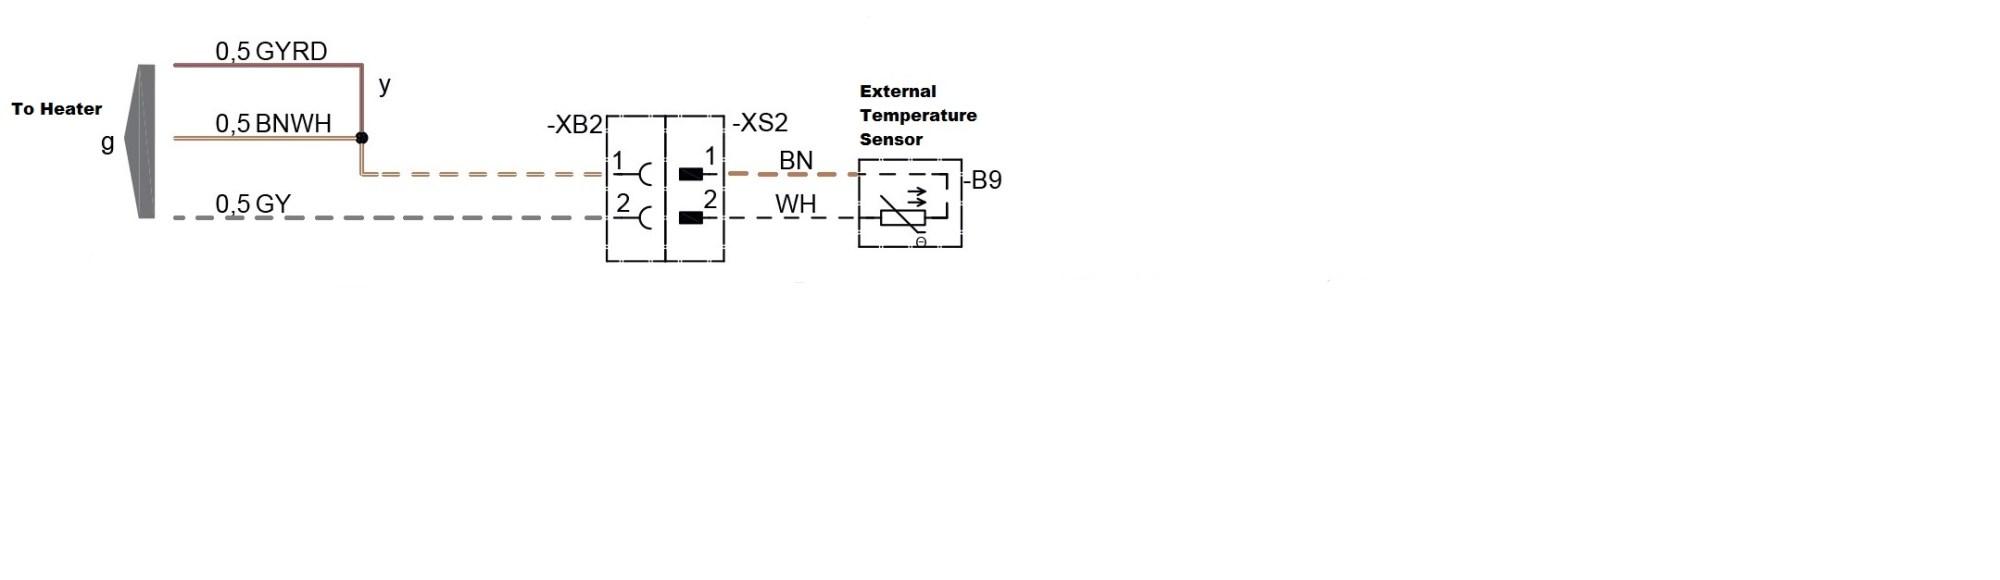 hight resolution of external temperature sensor diagram